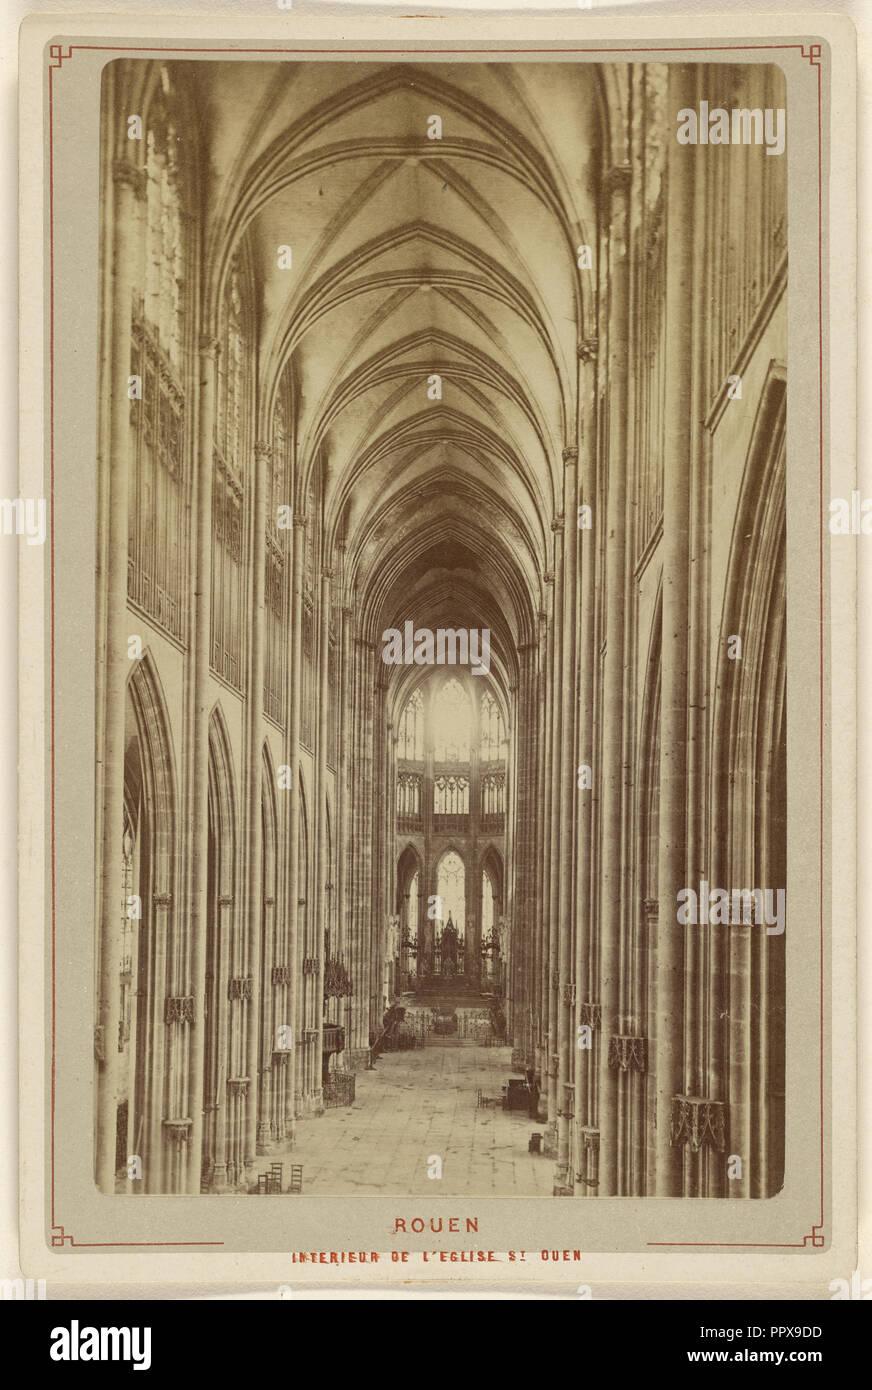 Rouen. Interieur de L'Eglise St. Ouen; Le Comte, Französisch, aktive Rouen, Frankreich 1860, ca. 1875; Eiklar silber Drucken Stockbild